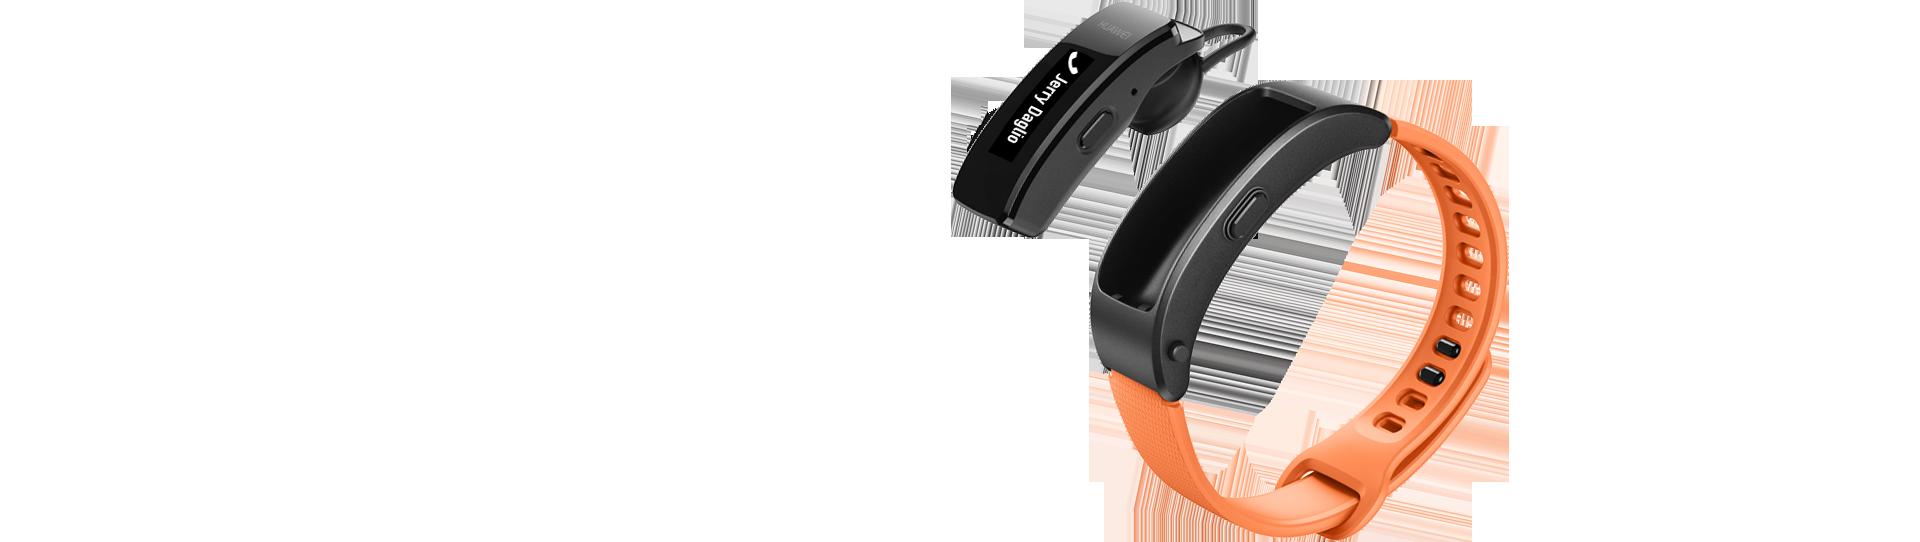 HUAWEI TalkBand B3 Lite, smartband, pedometer, Phone Finder | HUAWEI